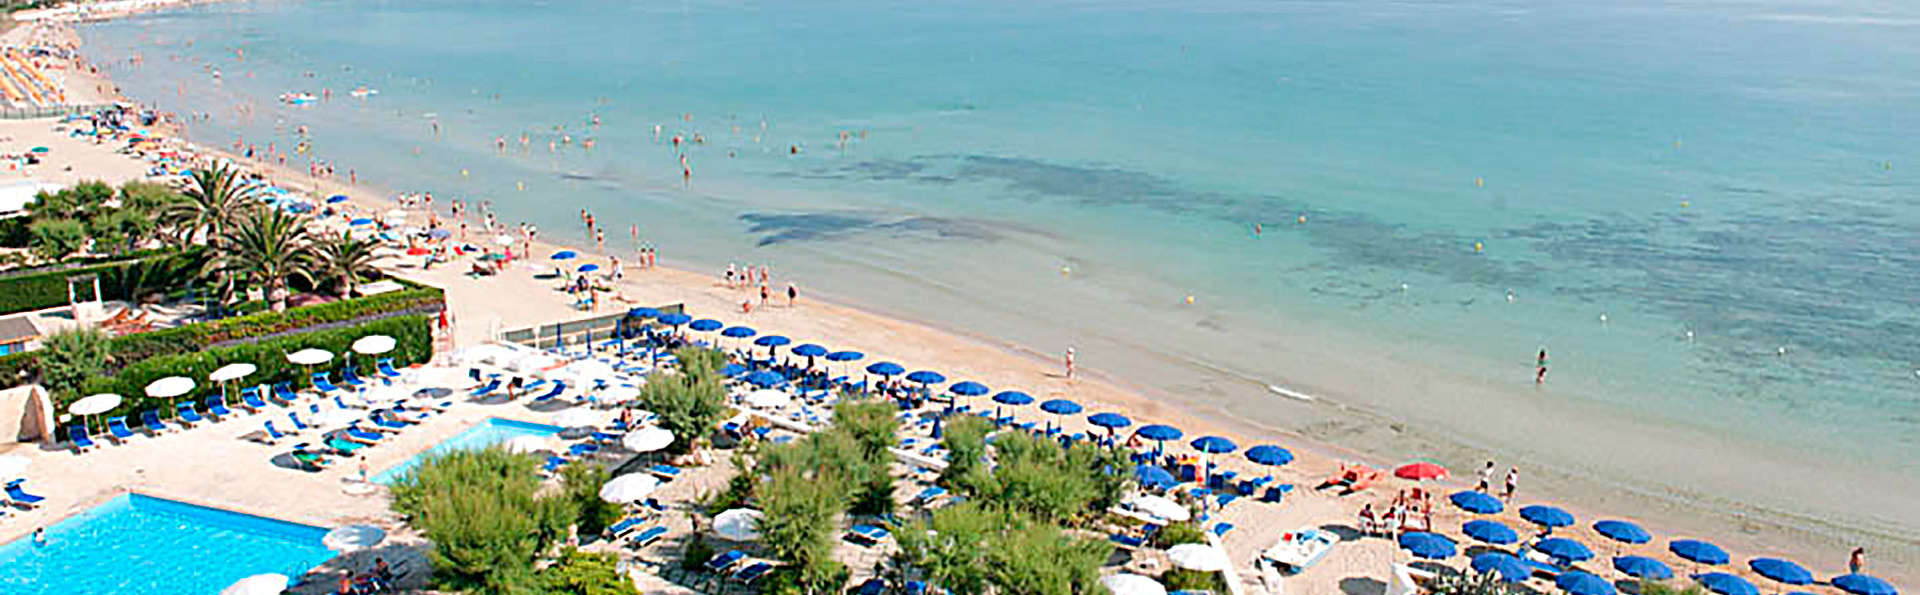 Hotel Sierra Silvana - EDIT_beach.jpg